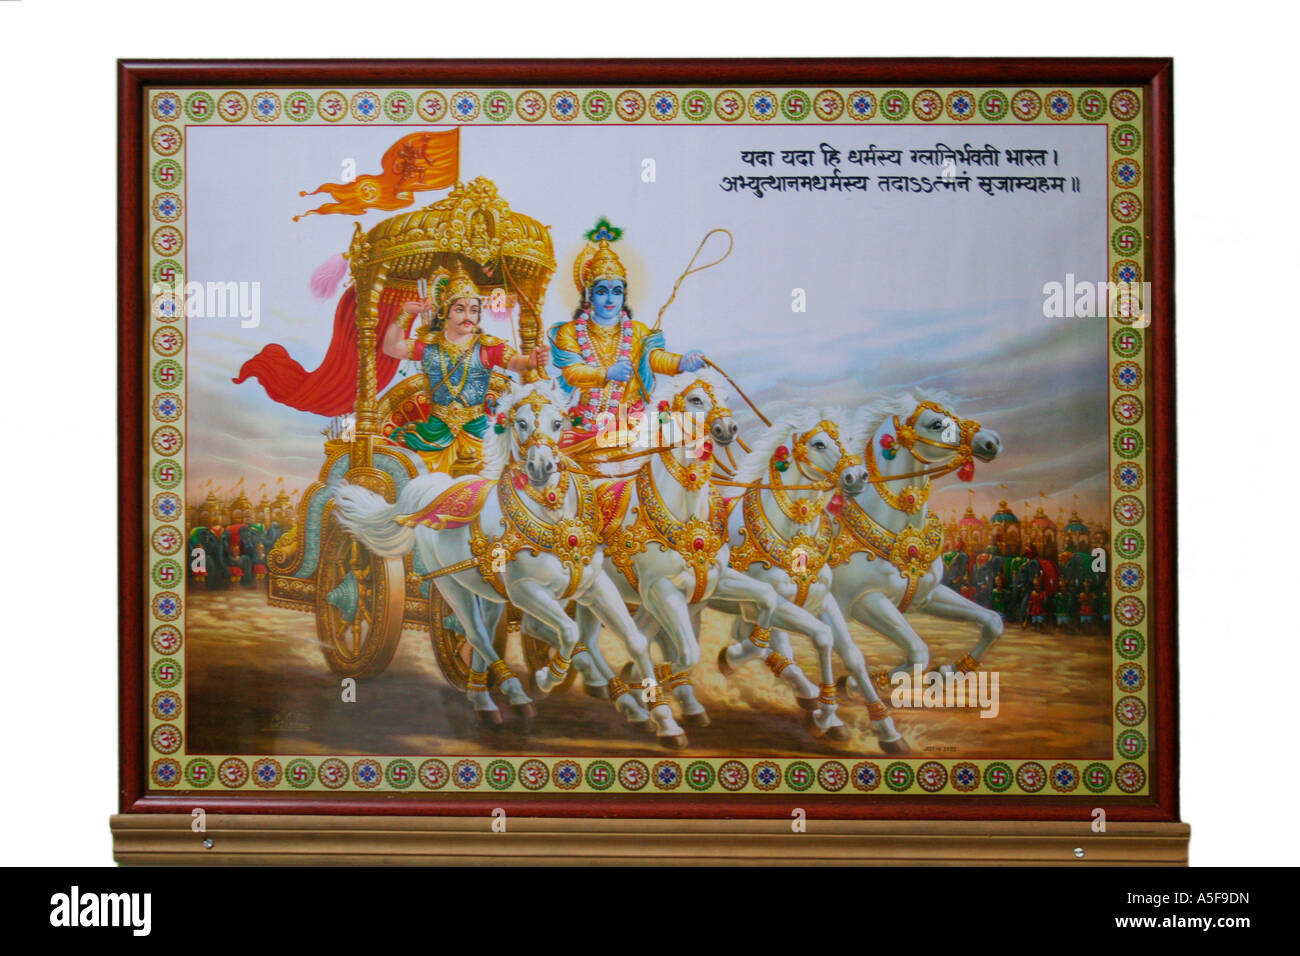 Lord Krishna and Arjuna painting from Mahabharata - Stock Image